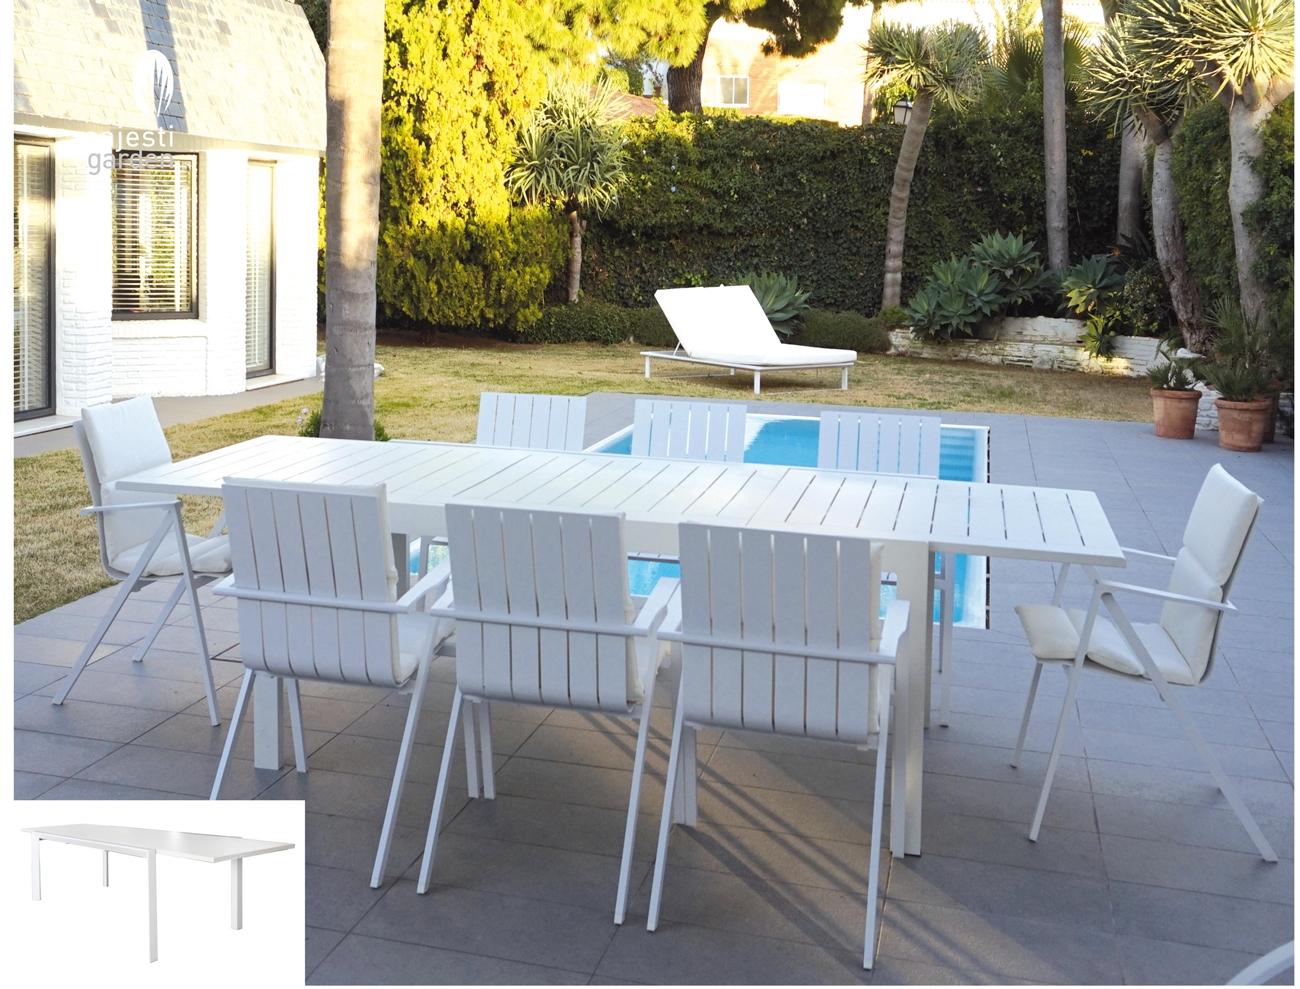 mia home Juego de mesa y sillas para exterior modelo MELBOURNE de ...